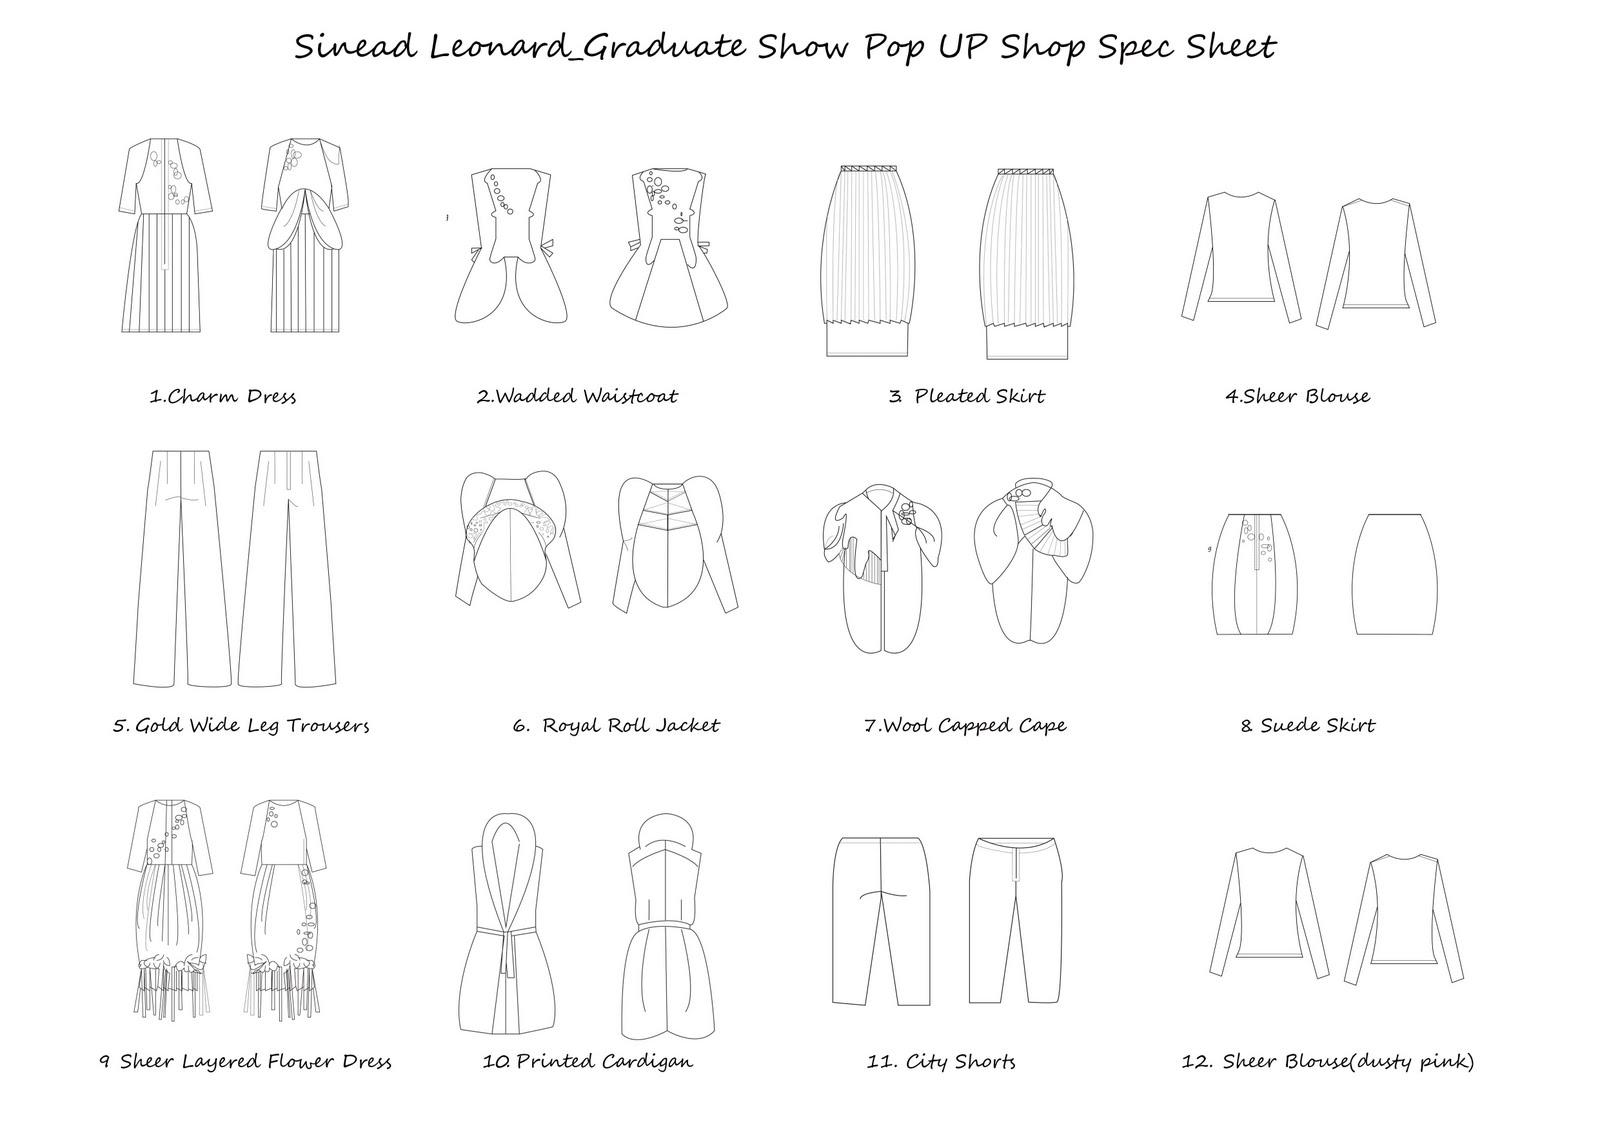 LSAD fashion graduates: Sinead Leonard